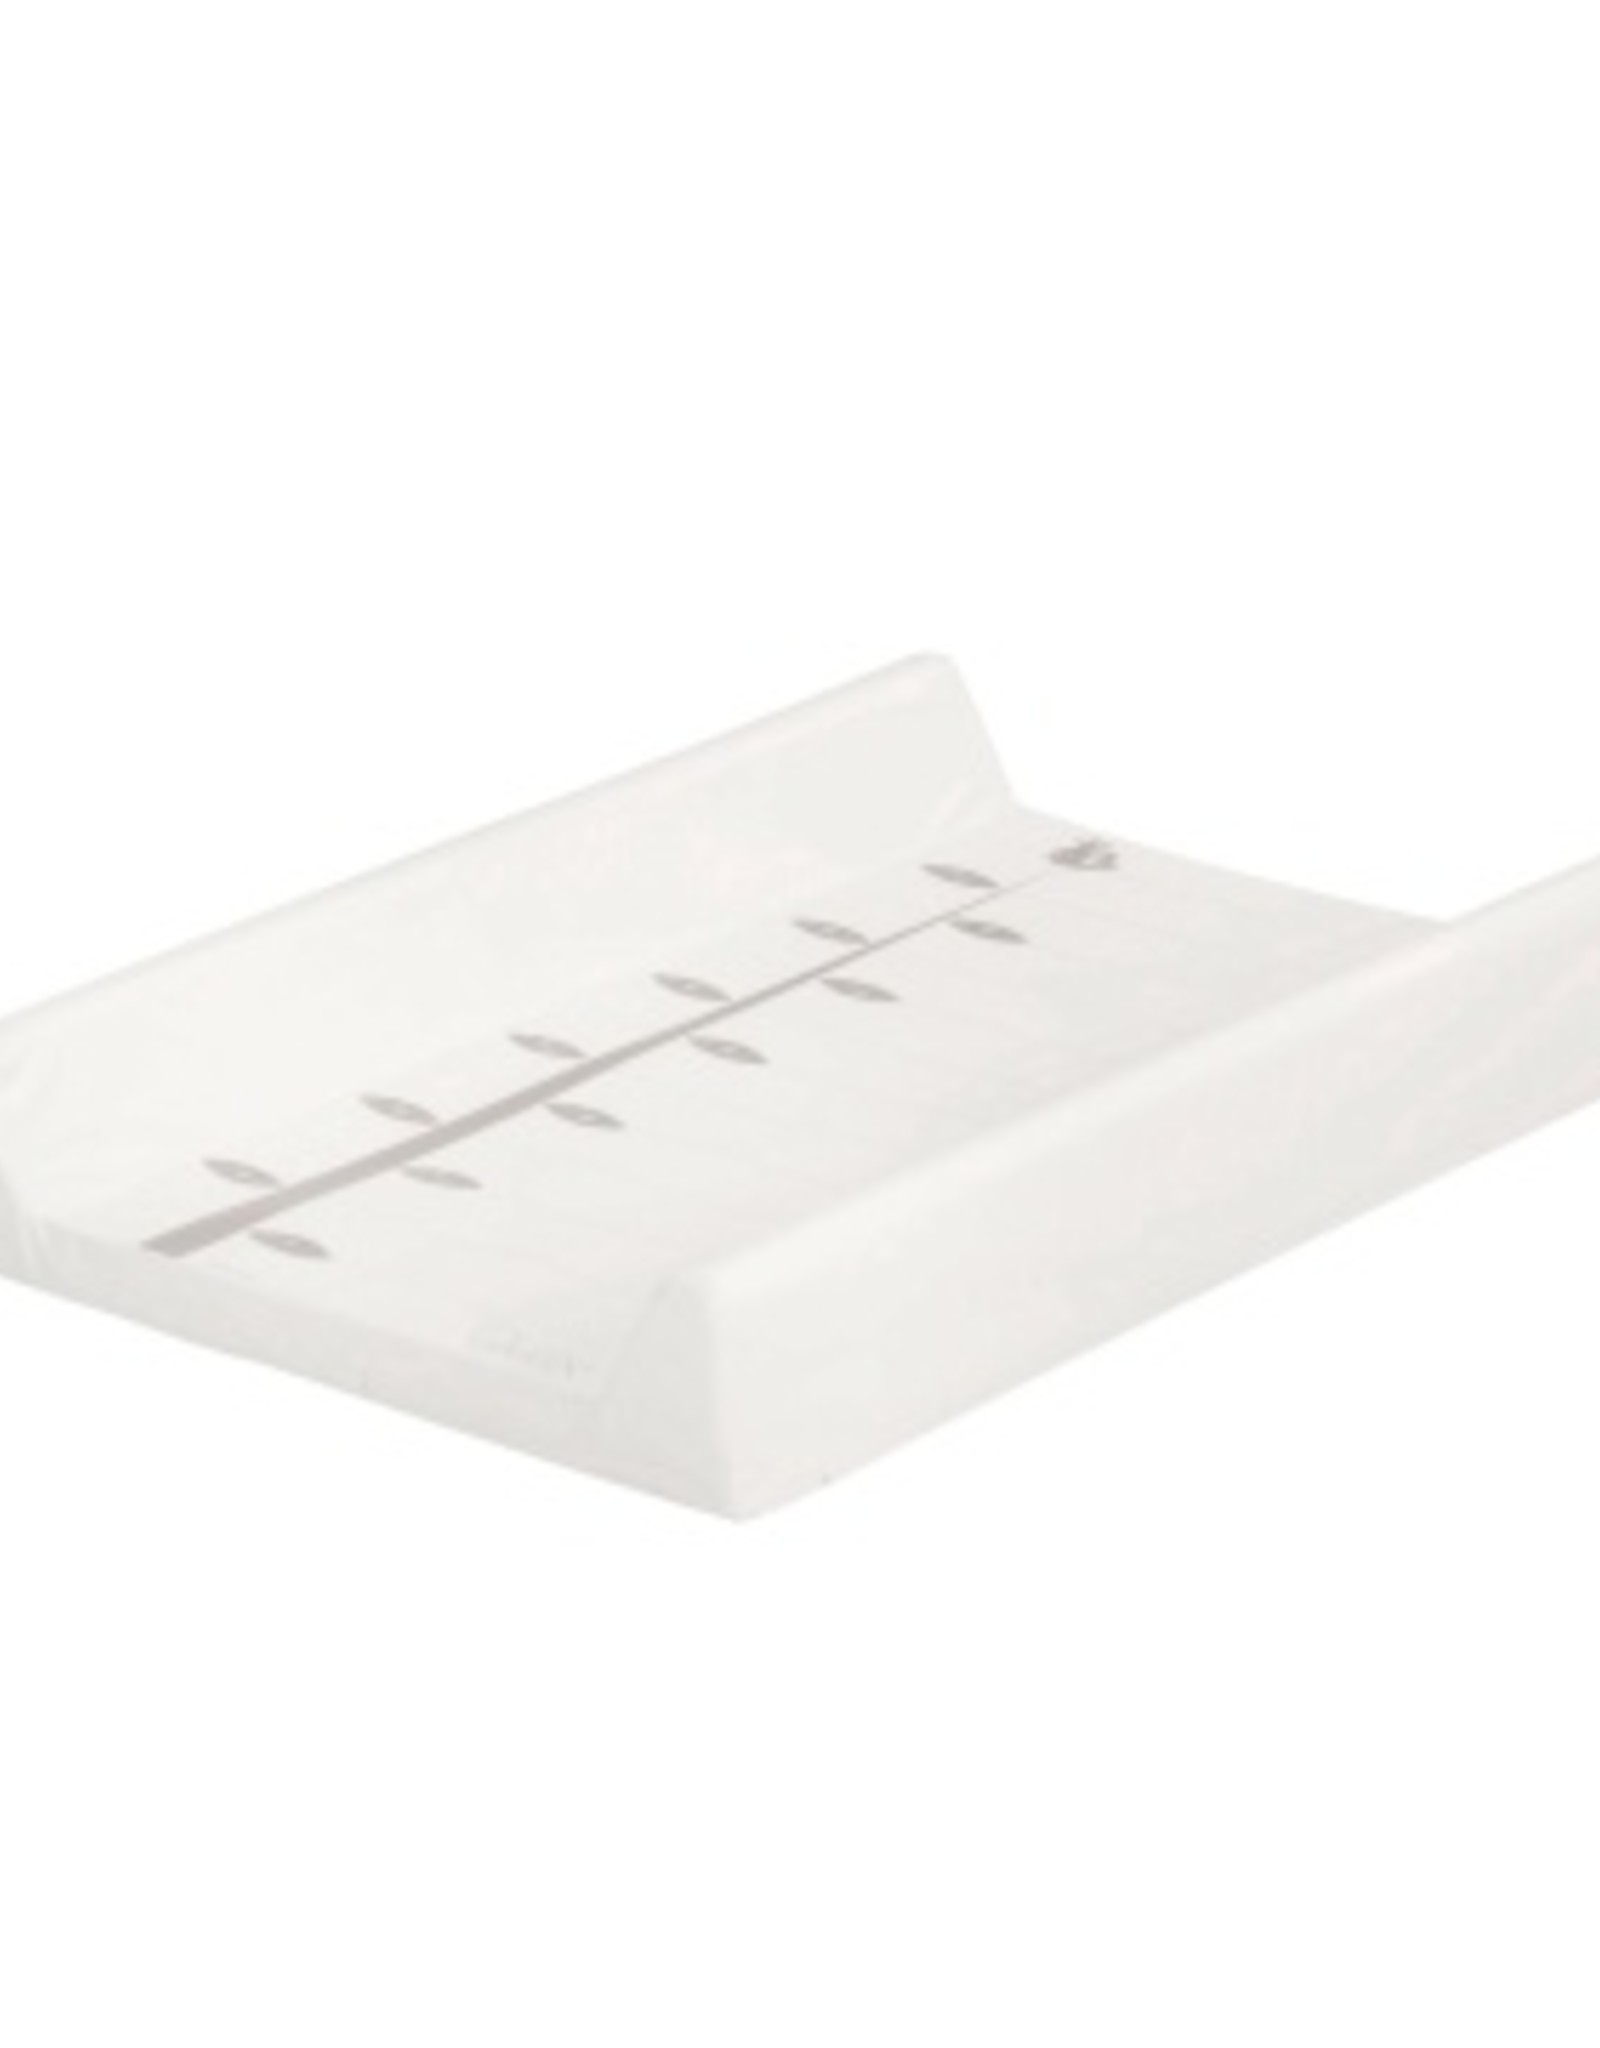 Quax Changing Pad - Ruler - White